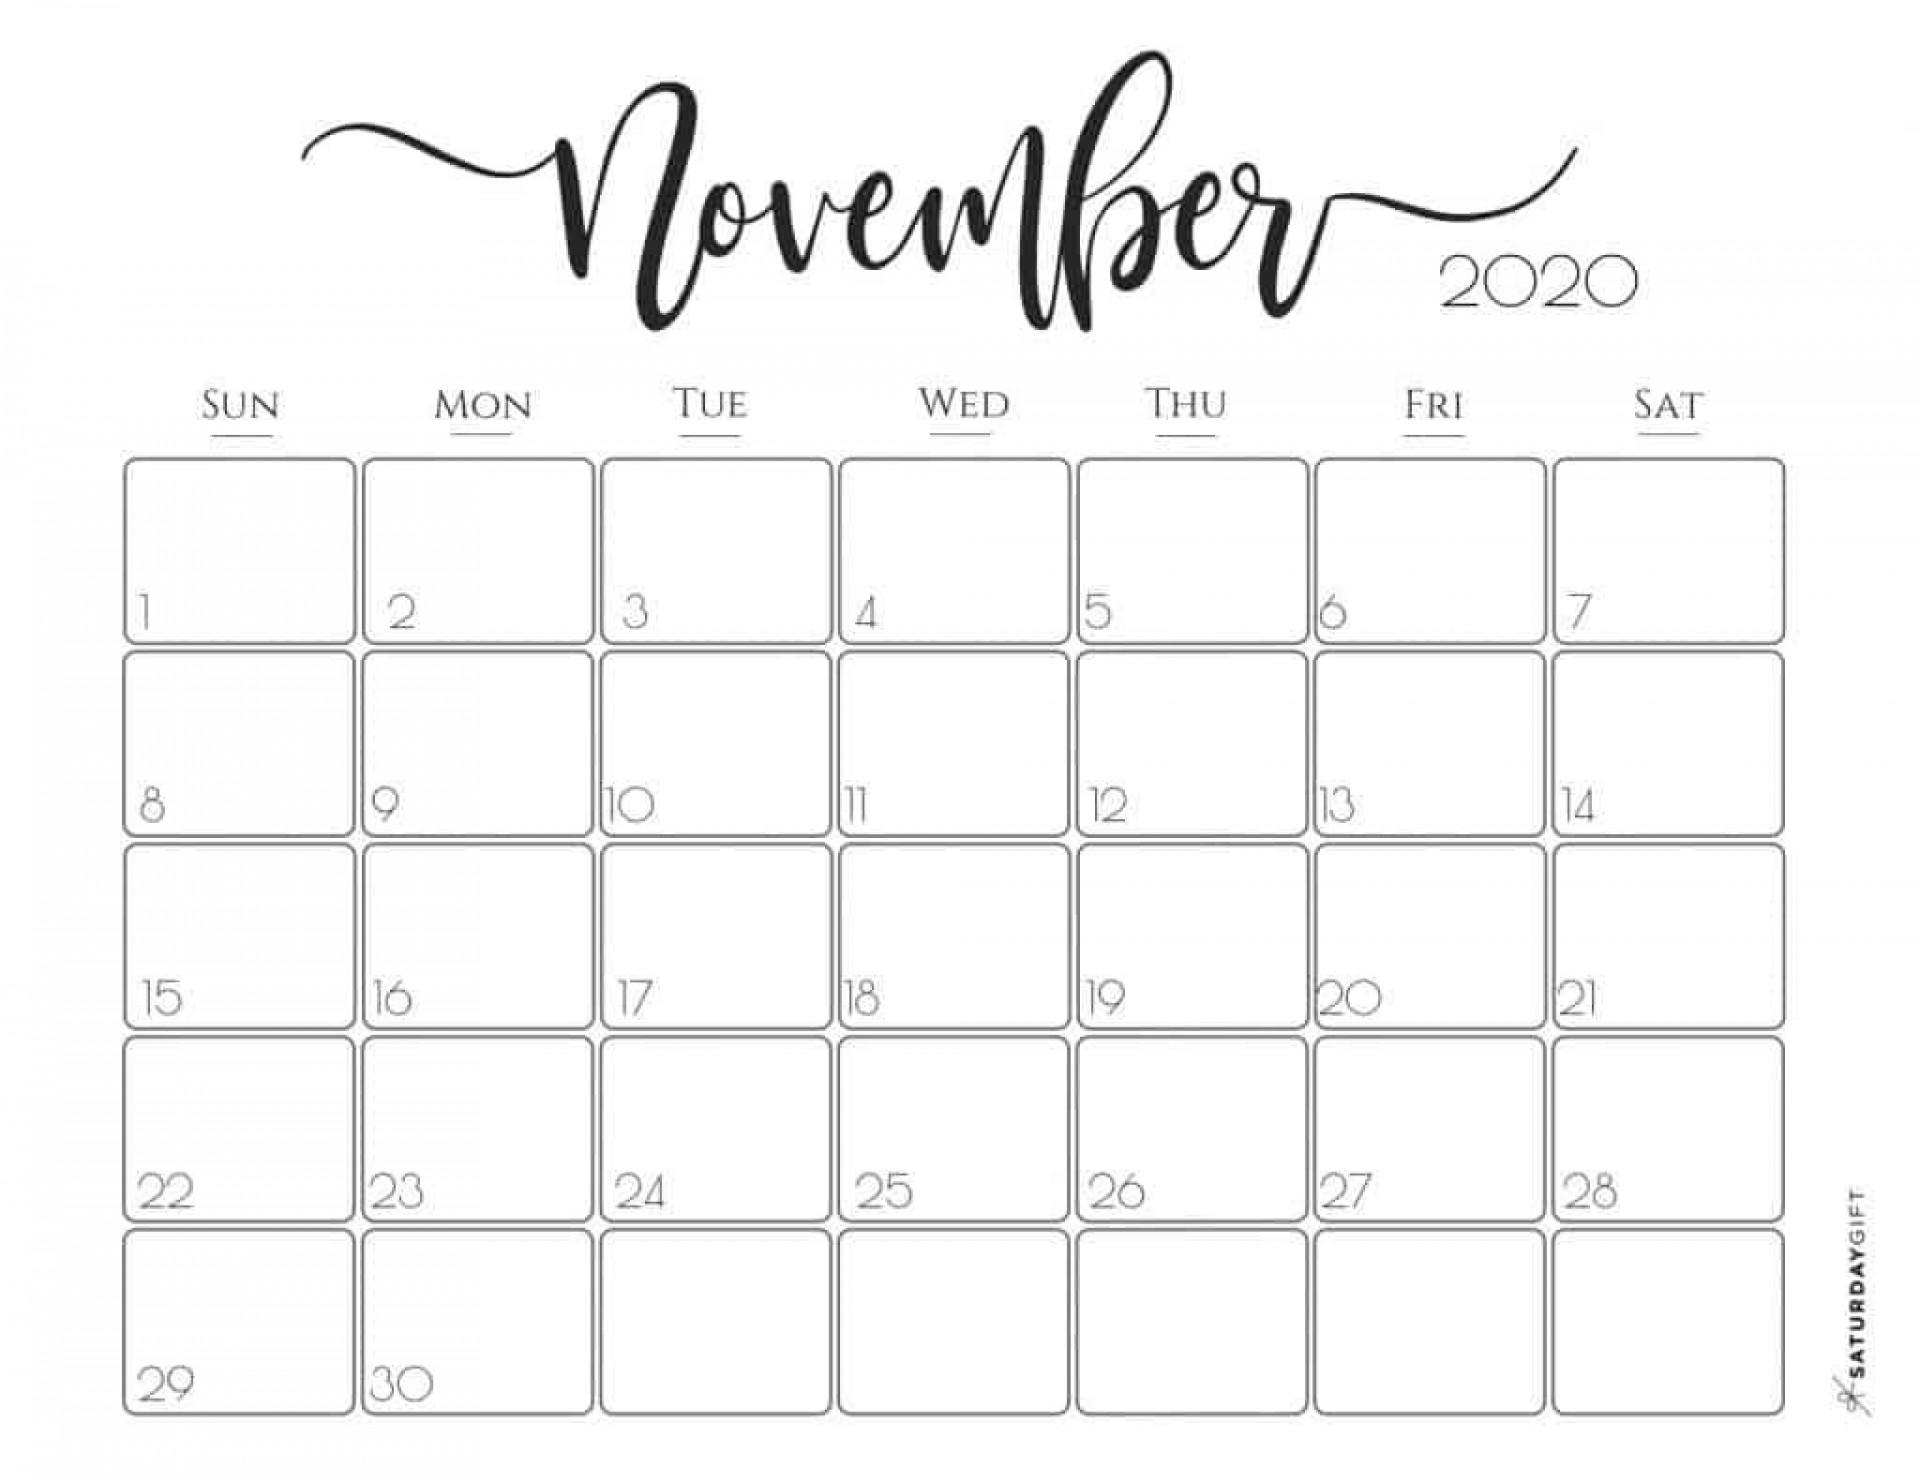 002 Awesome Printable Calendar Template November 2020 Image  Free1920